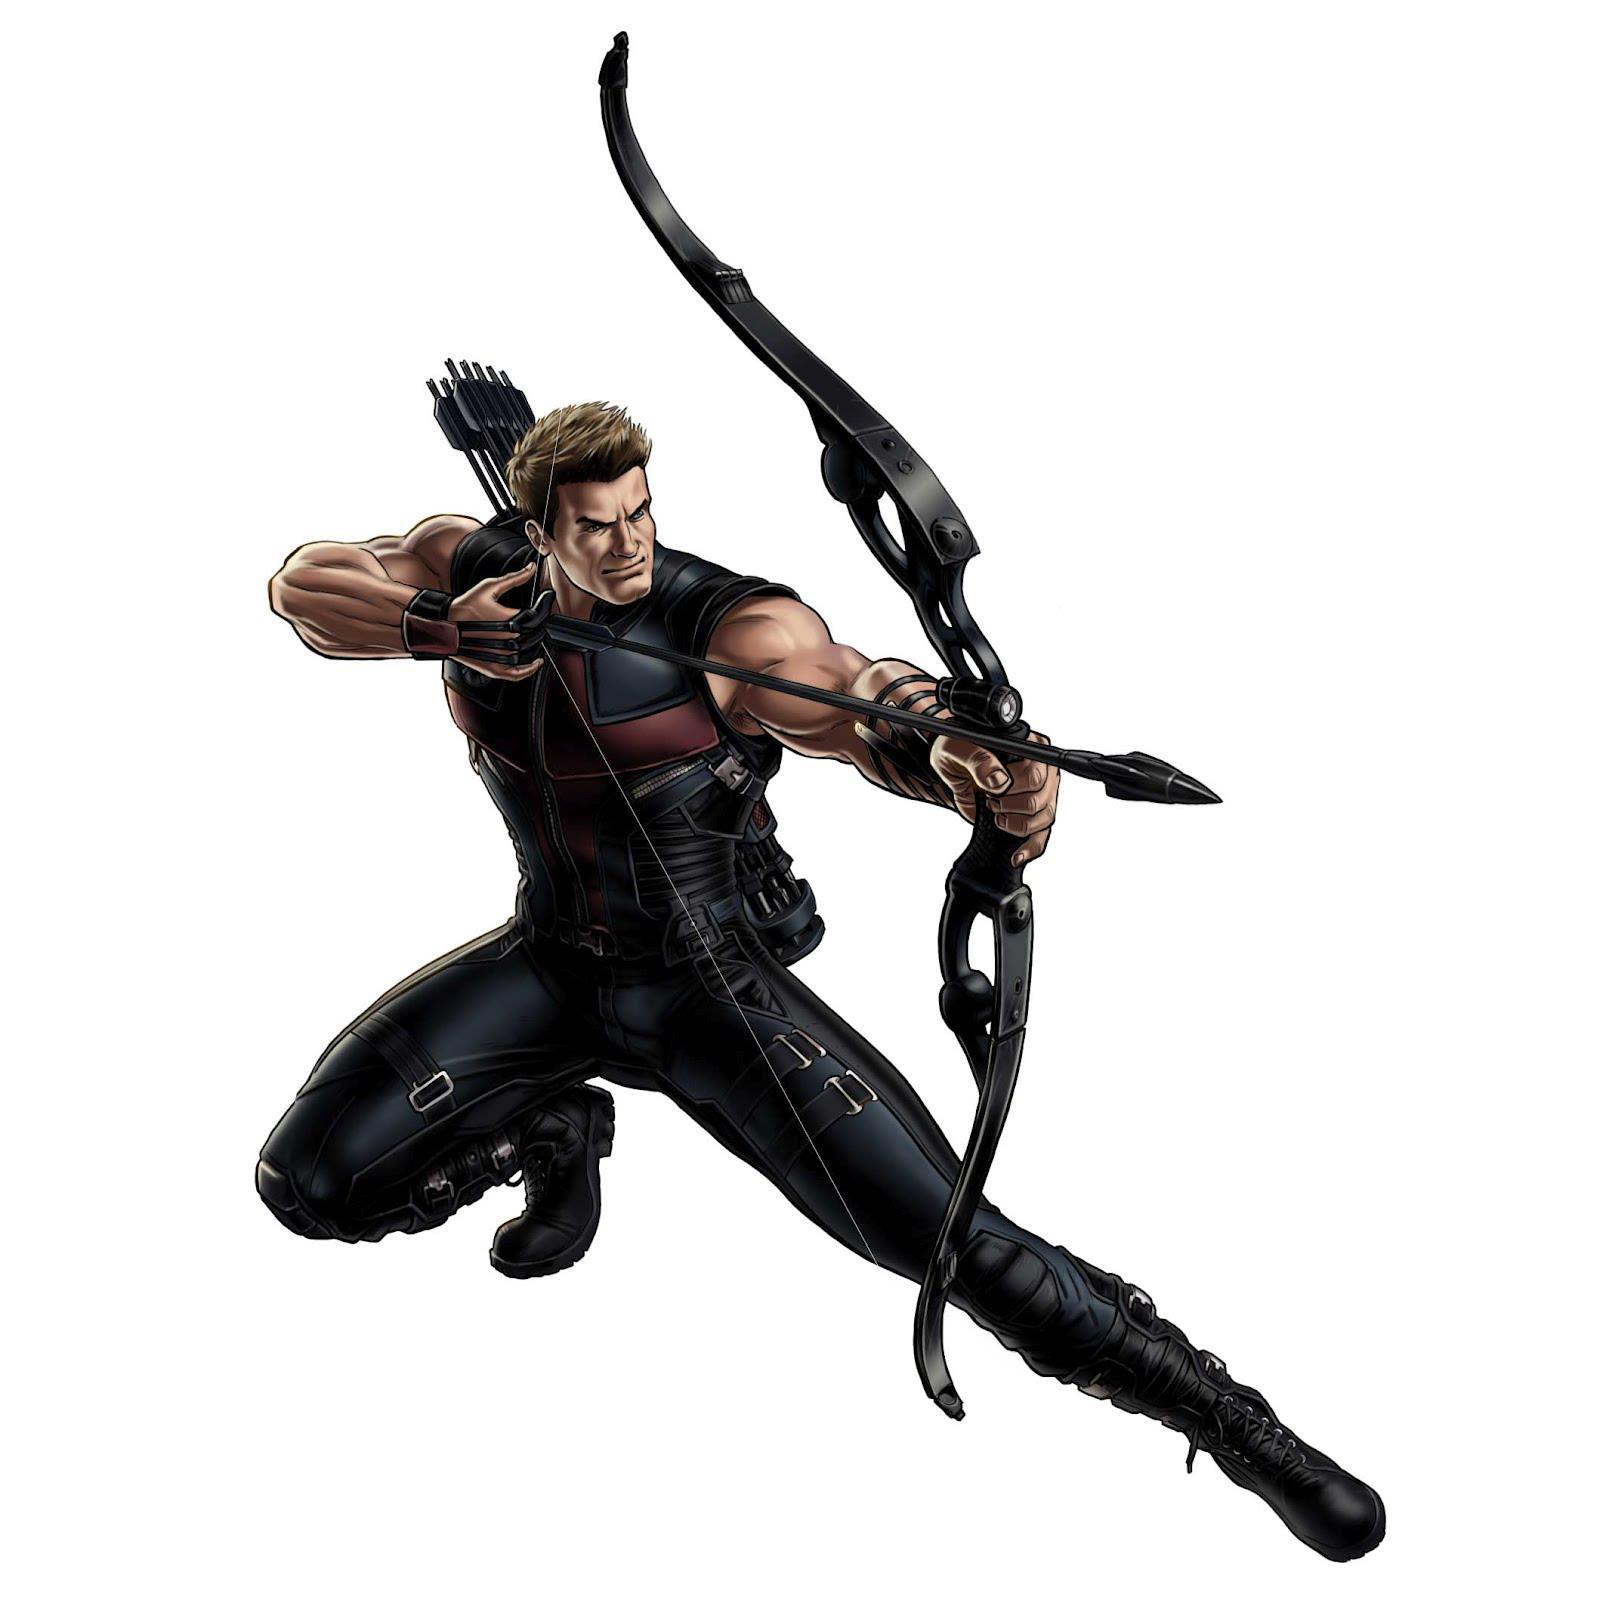 Image Hawkeye Fb Artwork 3 Jpg Marvel Avengers